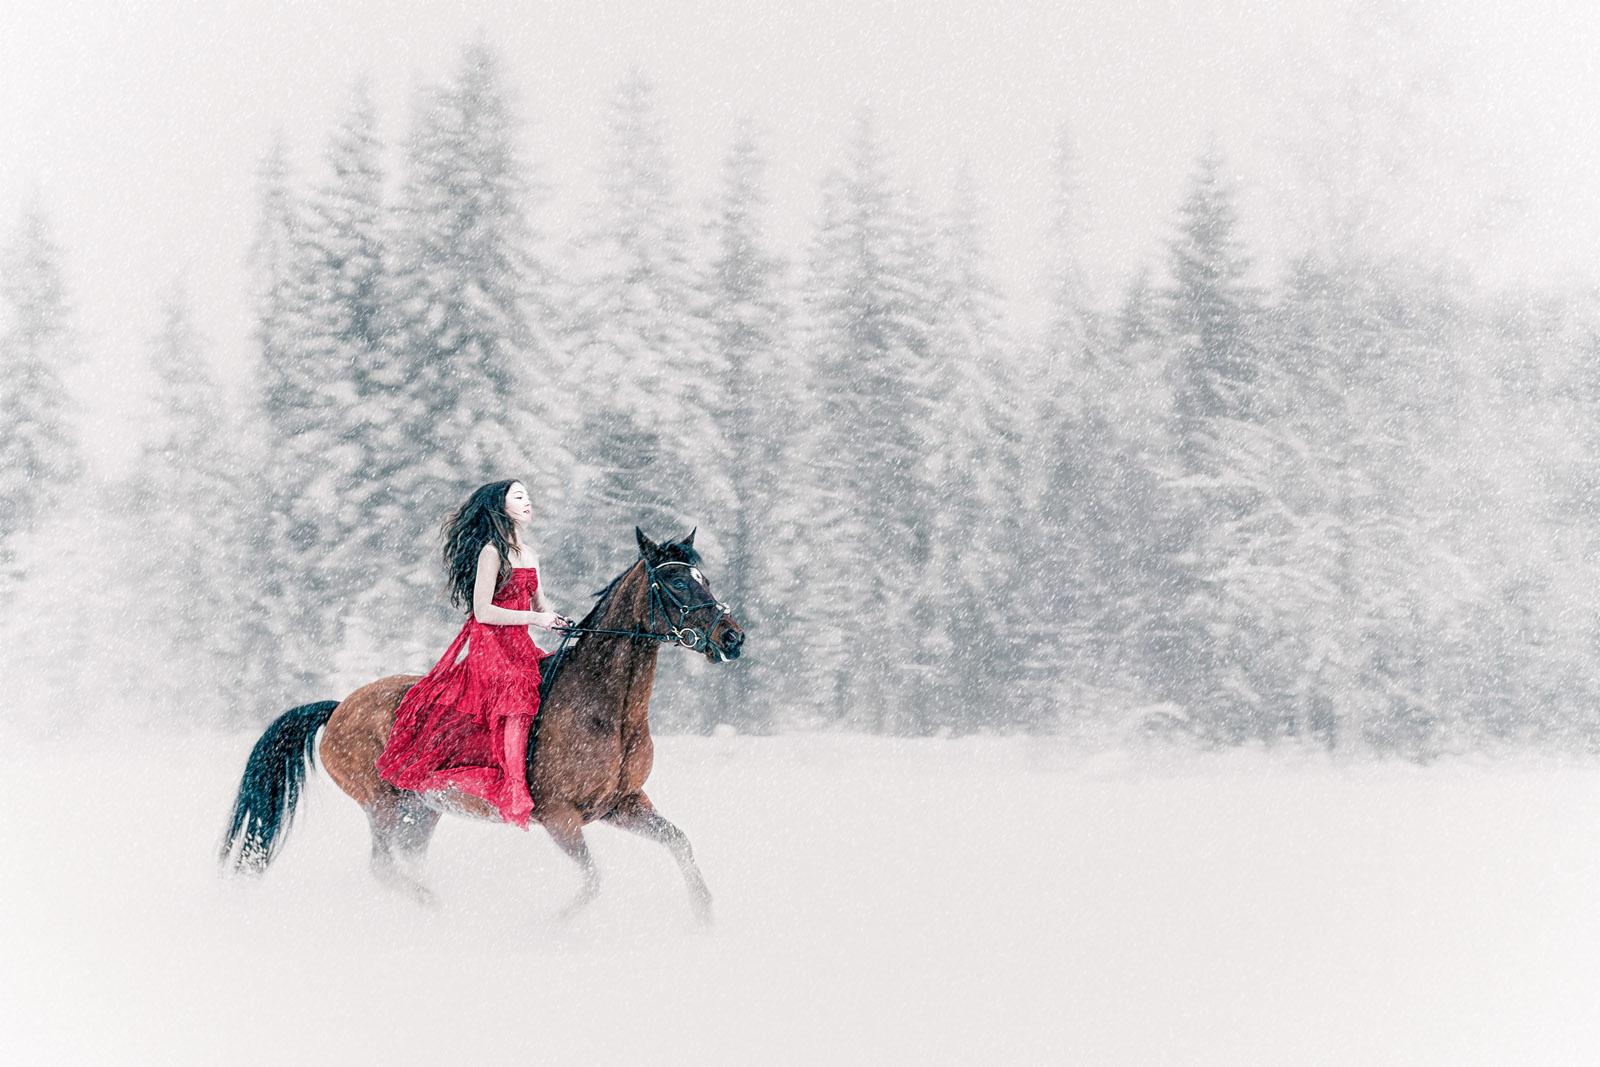 snow white, snow, rider, horse, winter, fairy tale, conceptual photographer, snövit, snö, ryttare, häst, vinter, saga, grimm, konceptuell fotograf